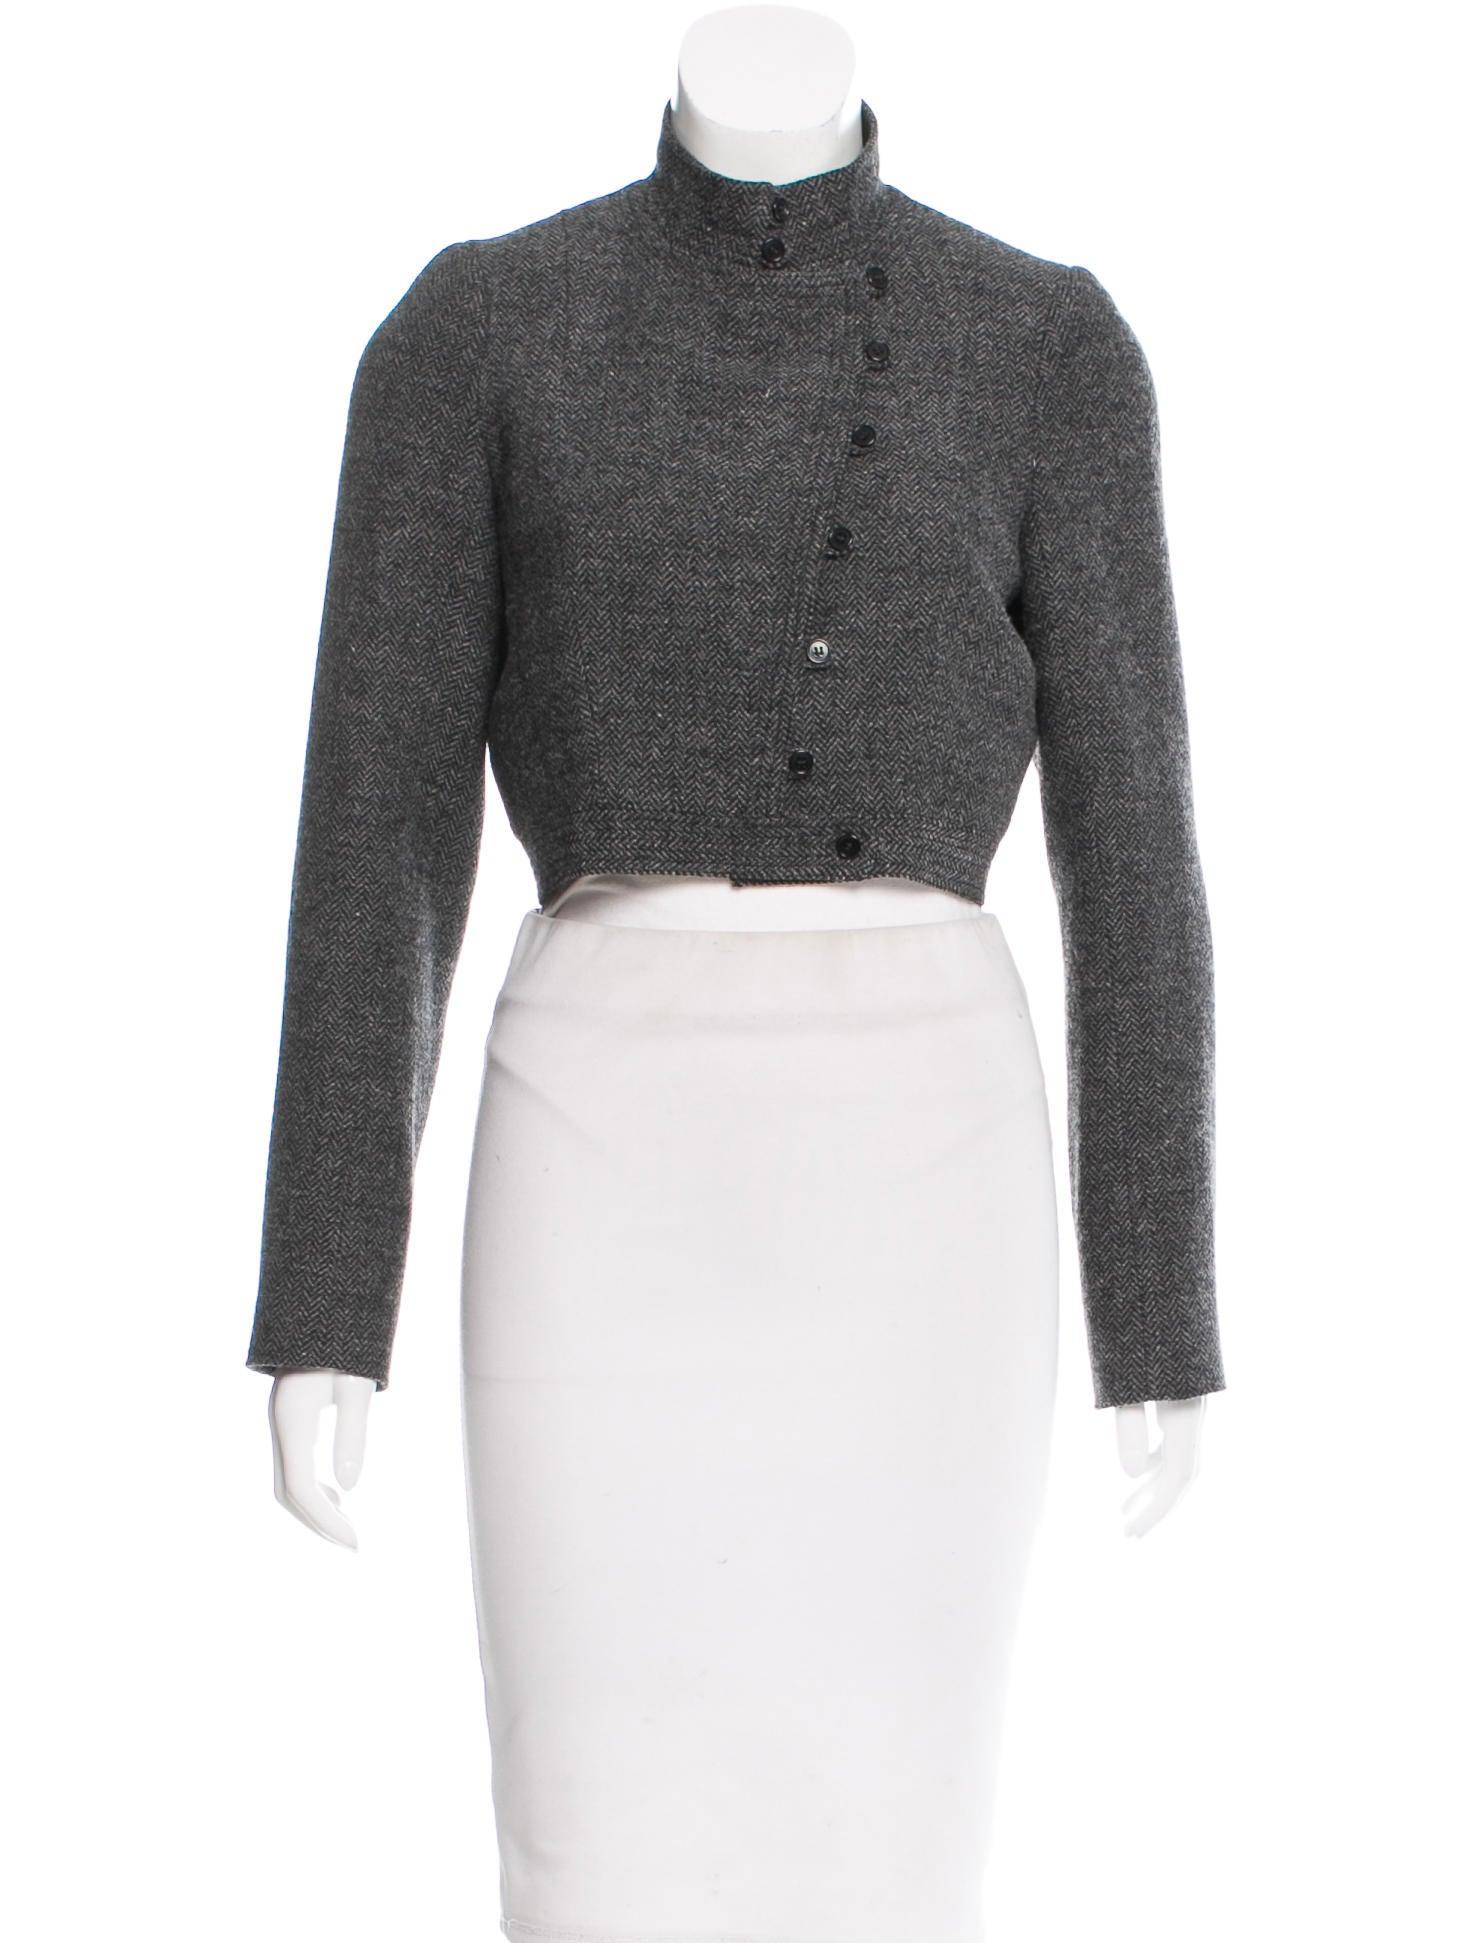 Morgane Le Fay Wool Herringbone Jacket Clothing